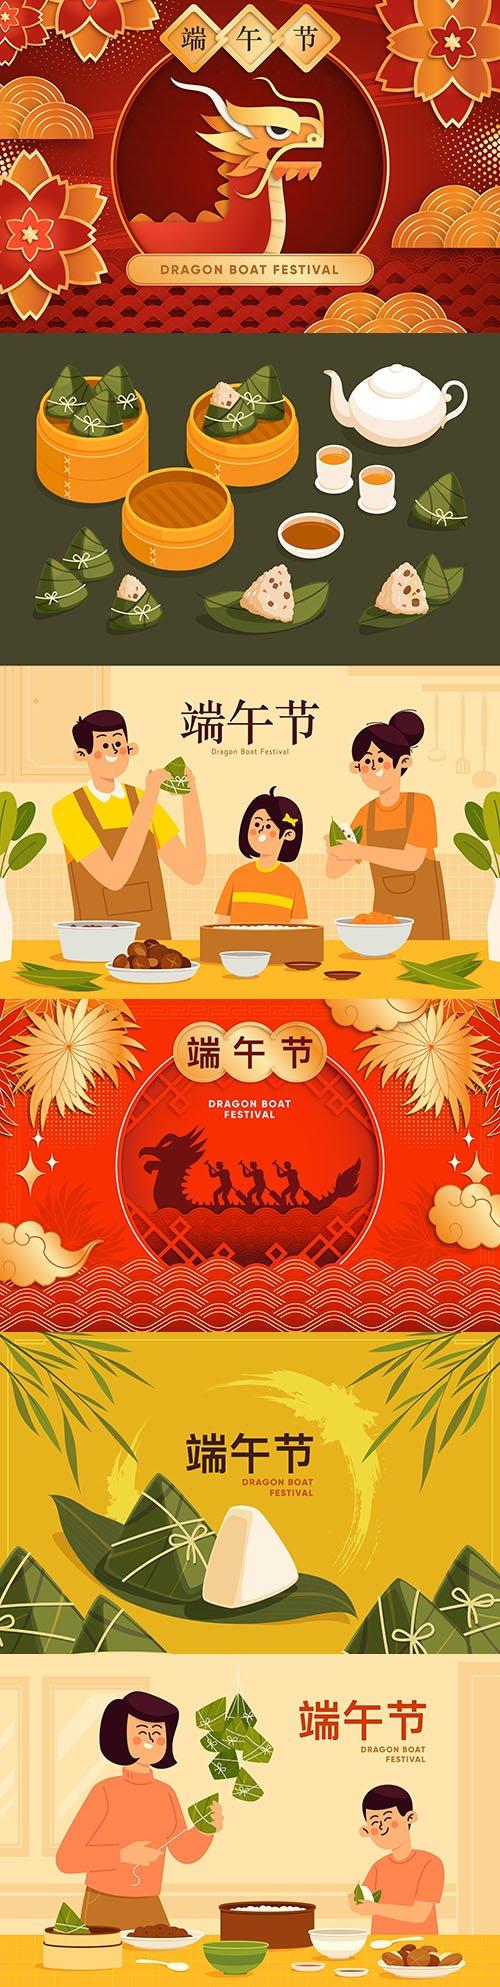 Chinese dragon boat festival design illustration 4